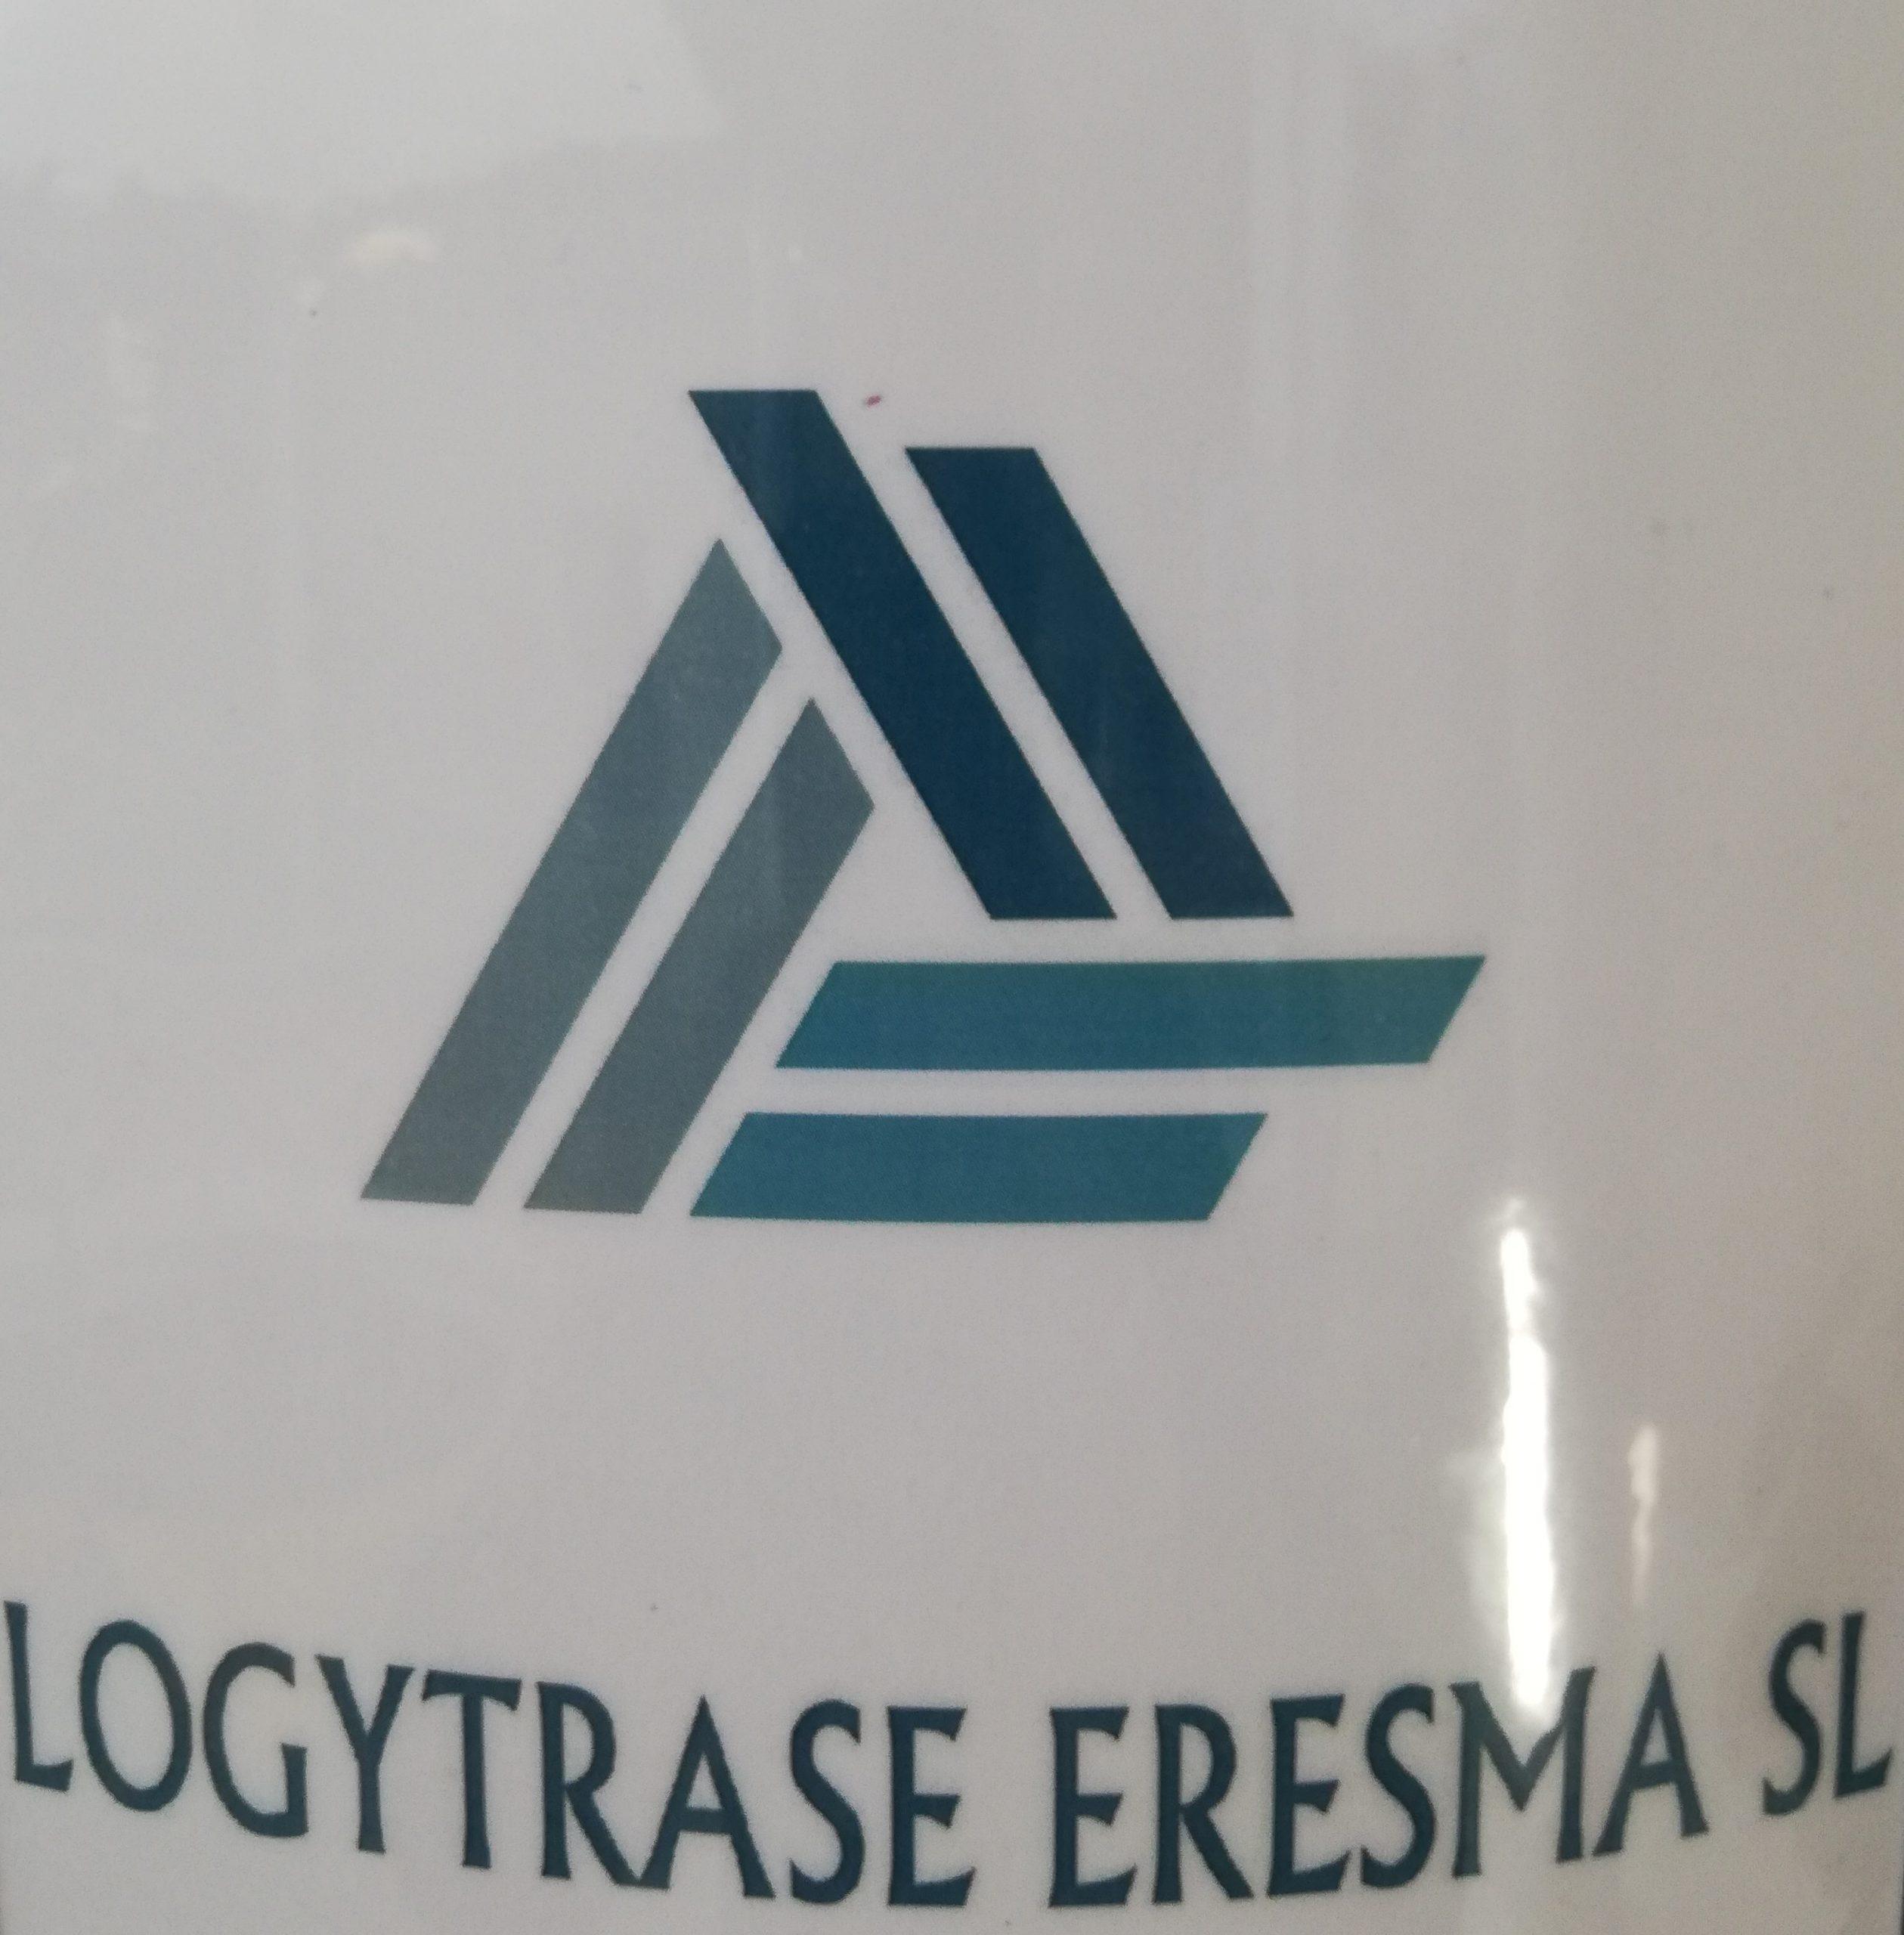 LOGYTRASE ERESMA